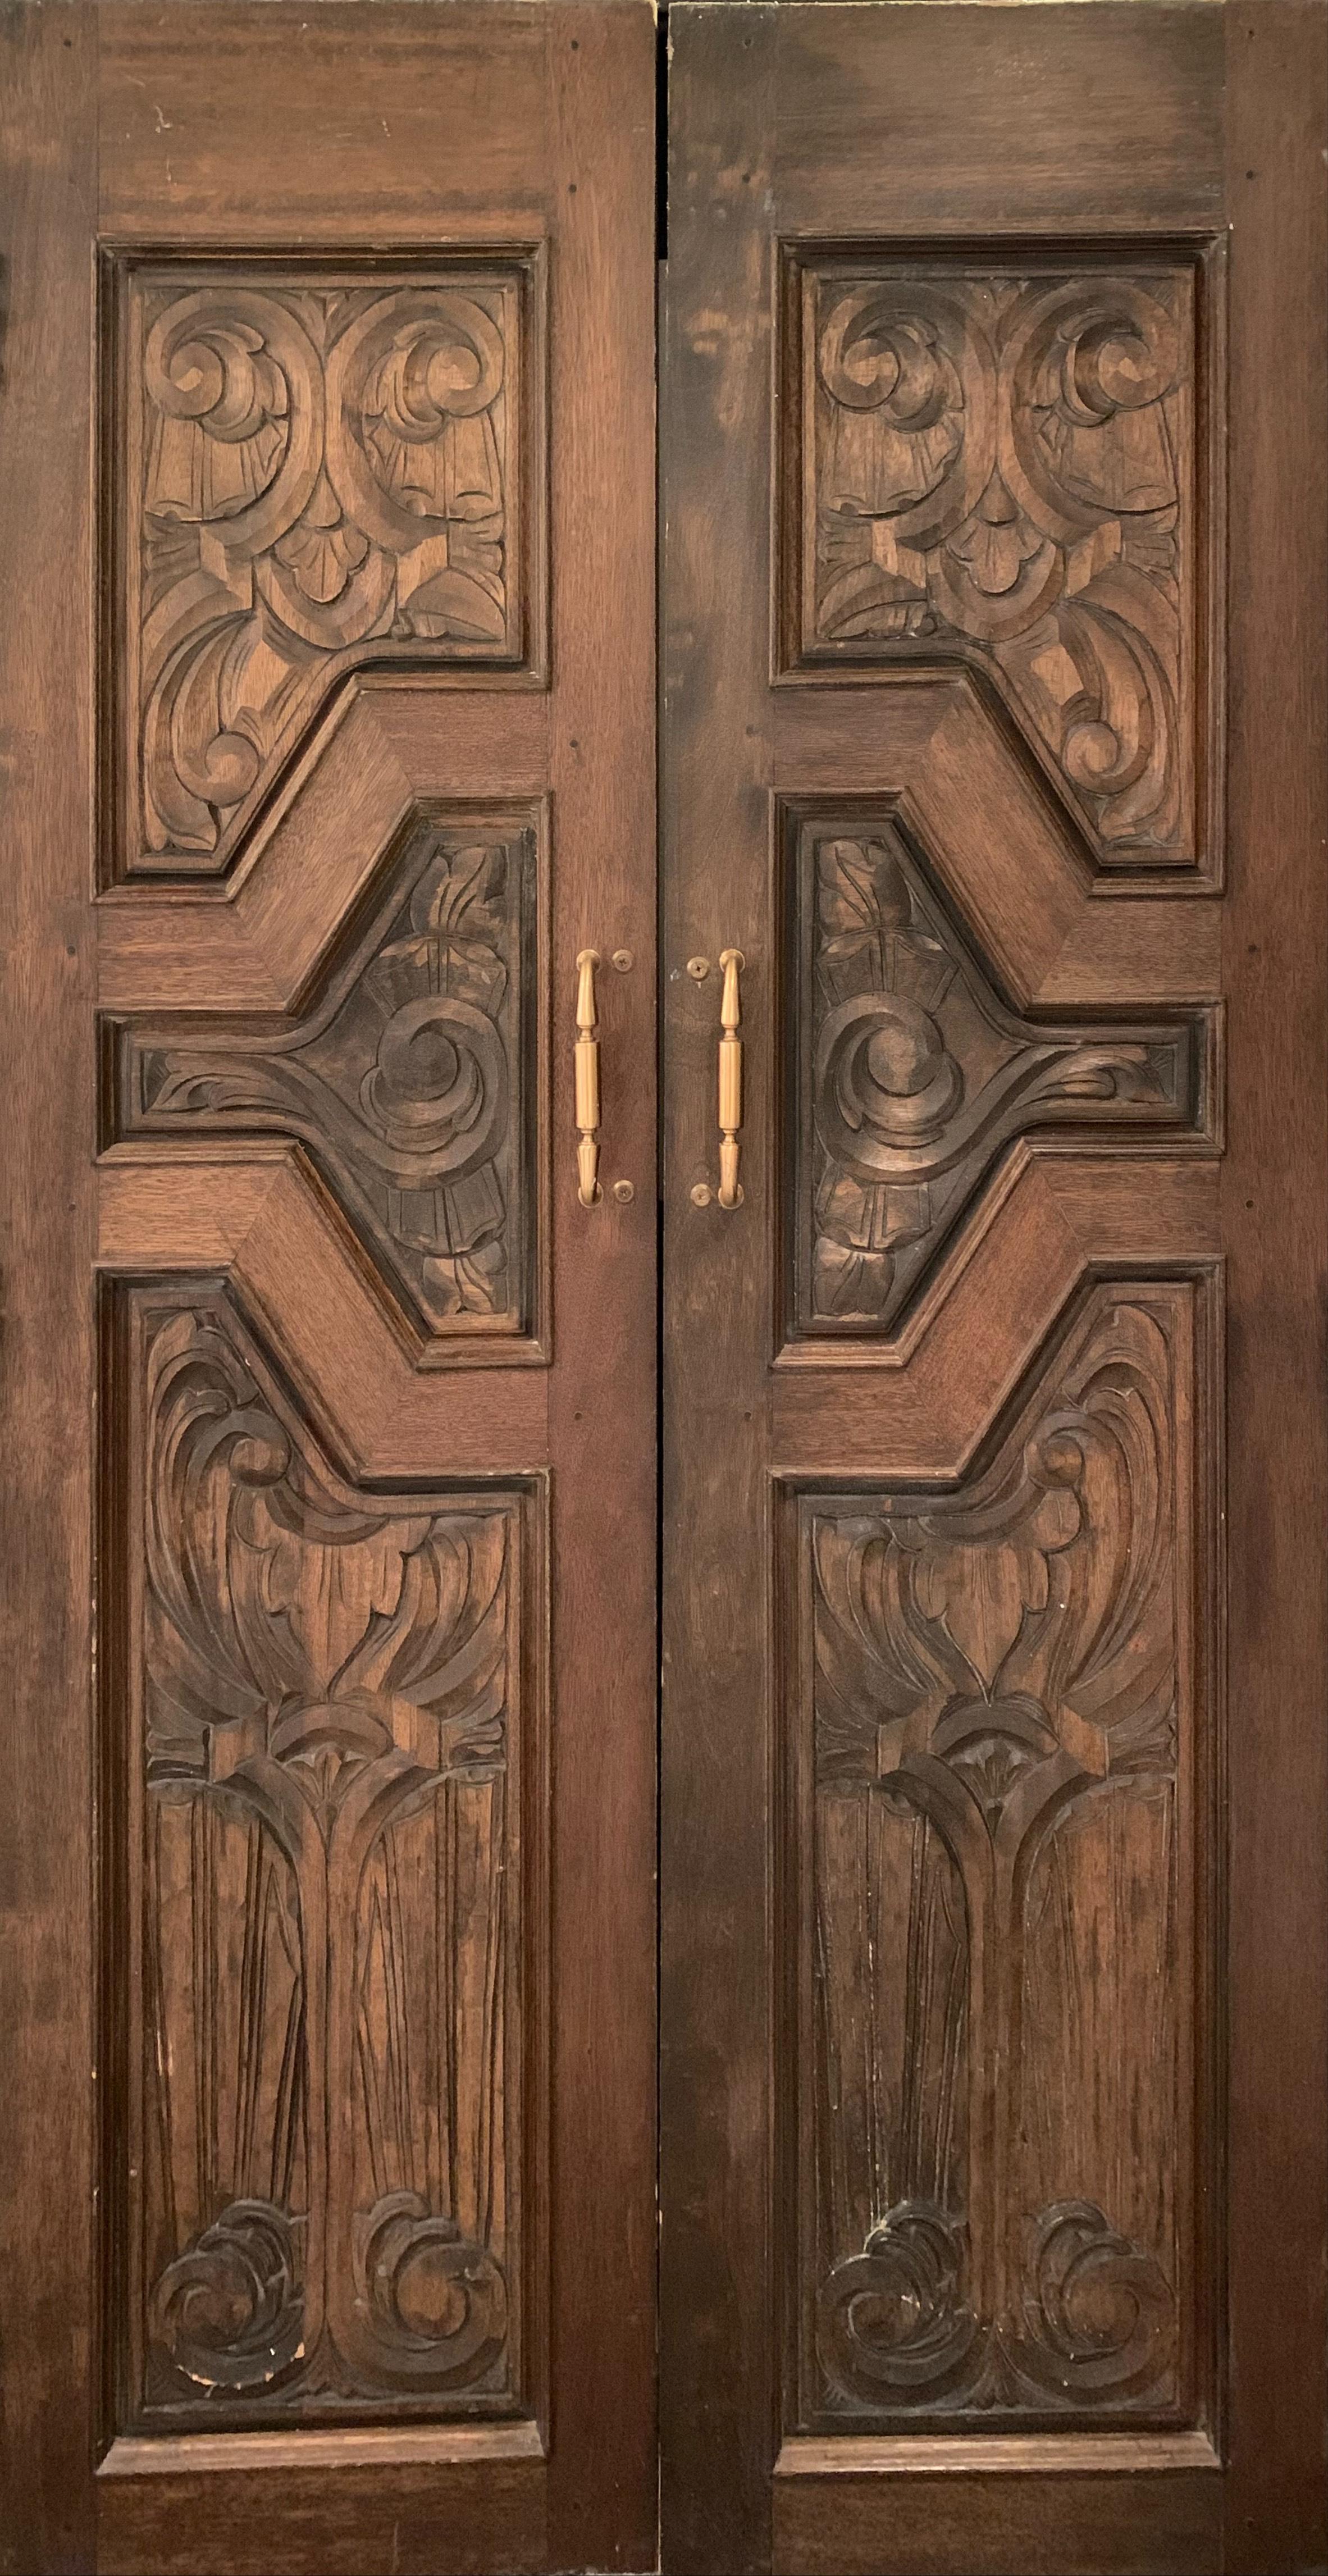 Hand Sculpted Wooden Doors